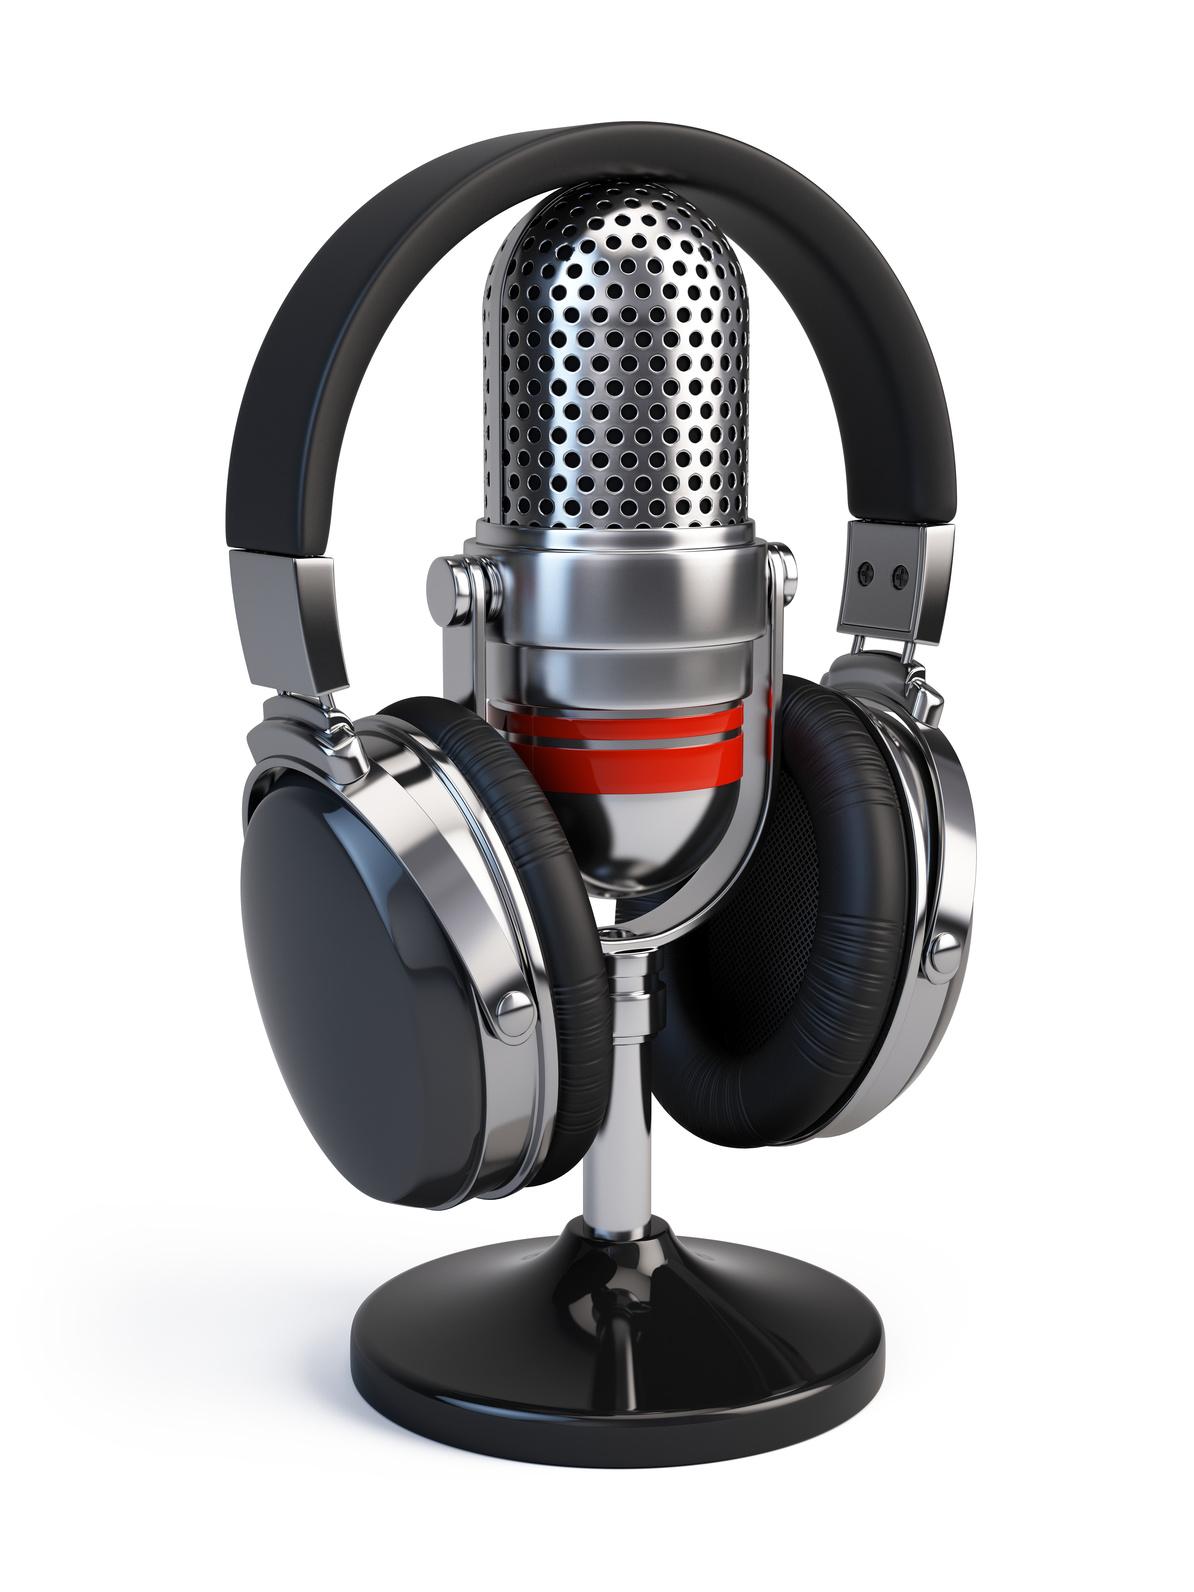 Saugus CA real estate radio station